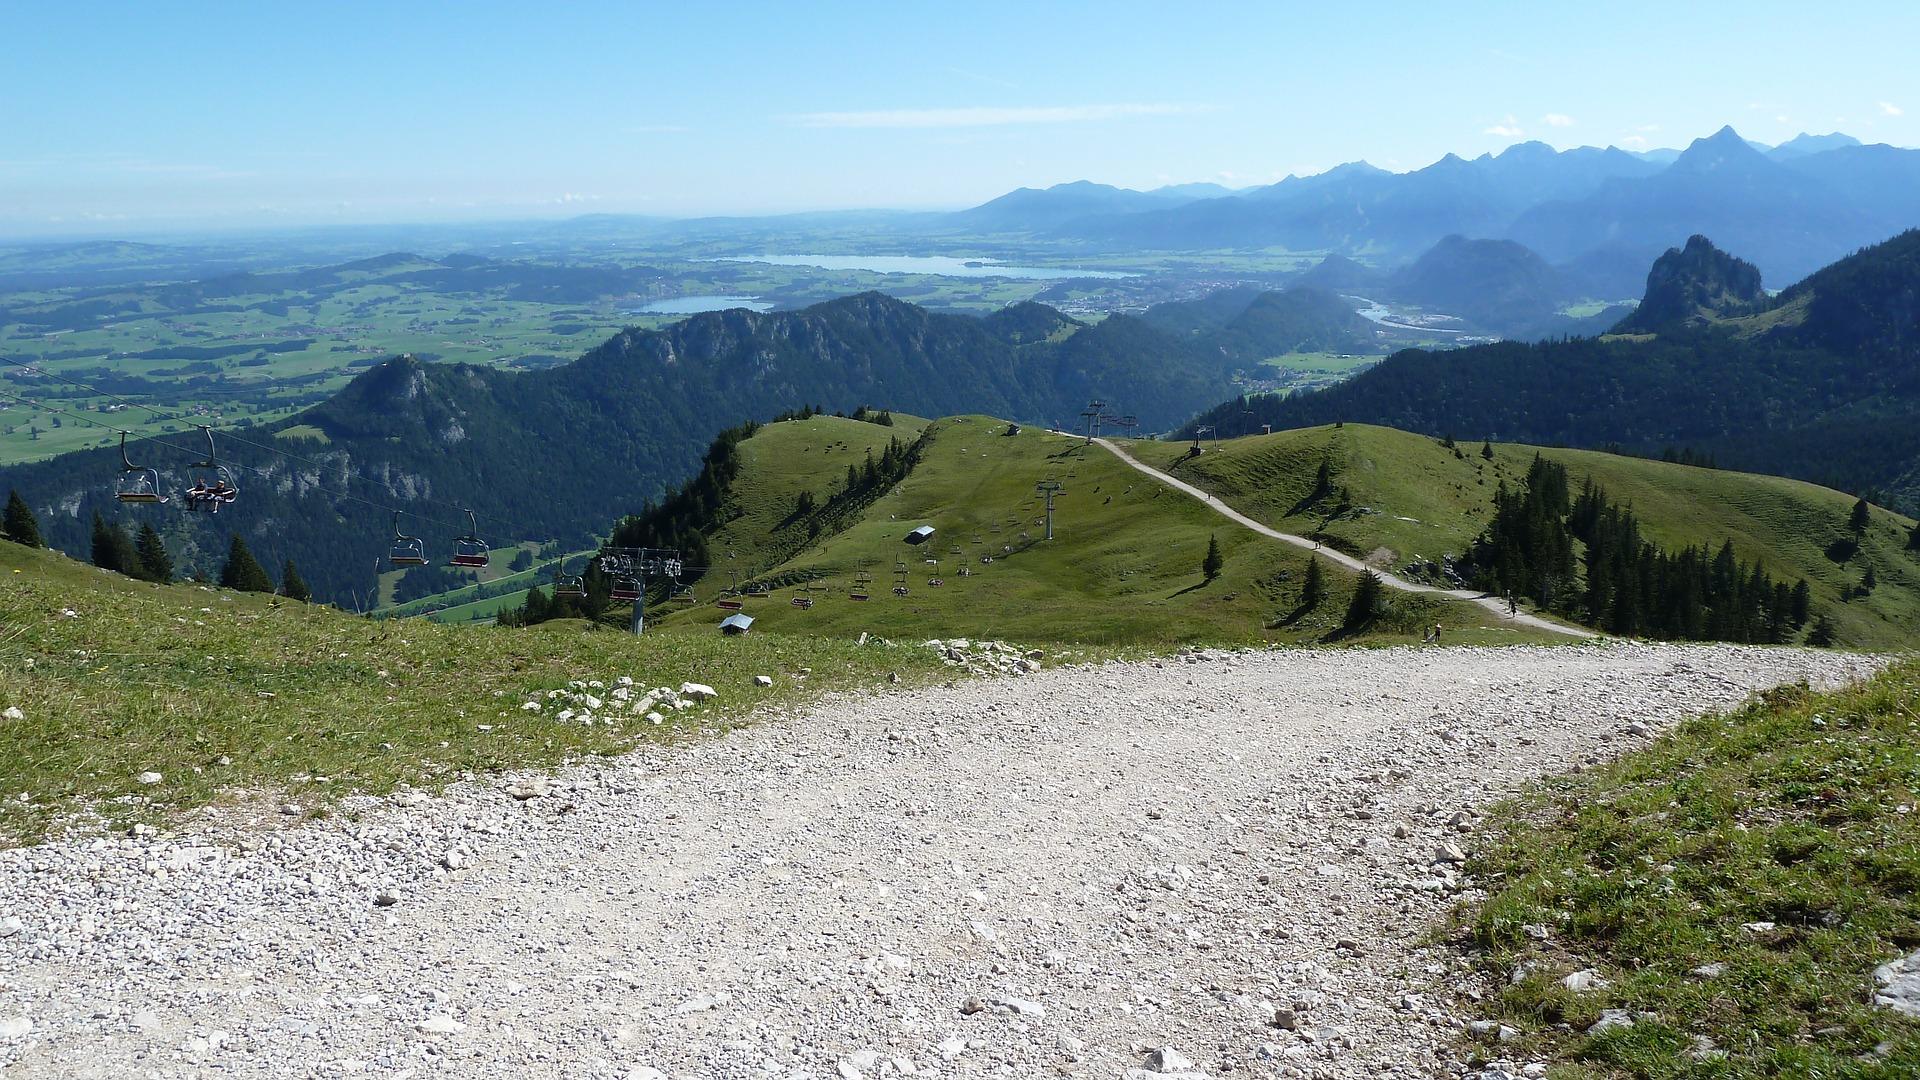 Schaukelweg in Breitenberg